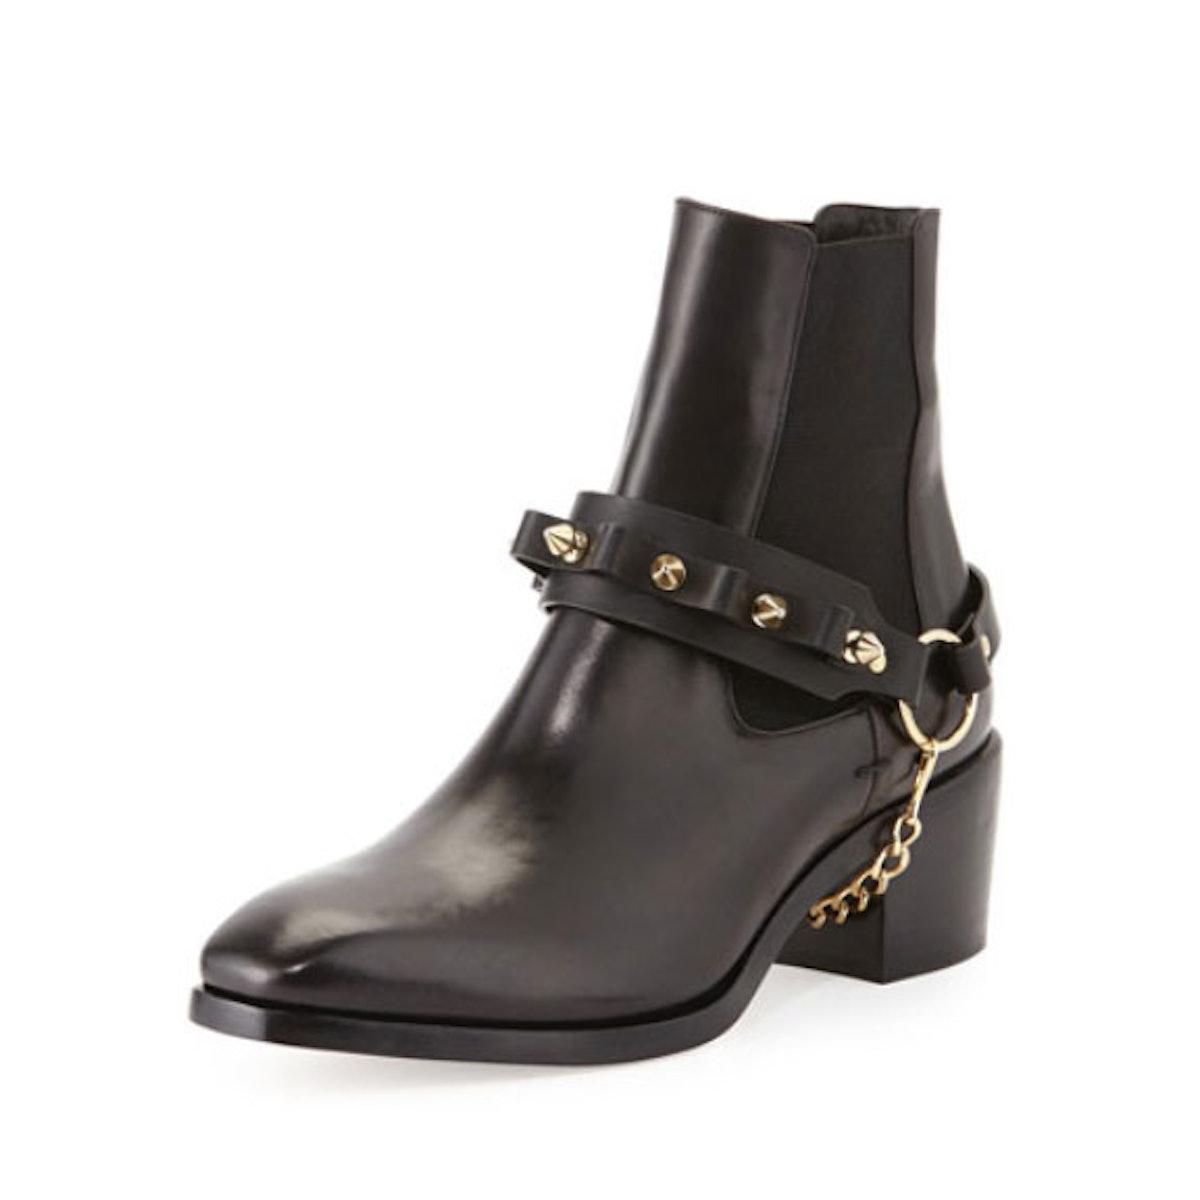 Daniele Michetti boots